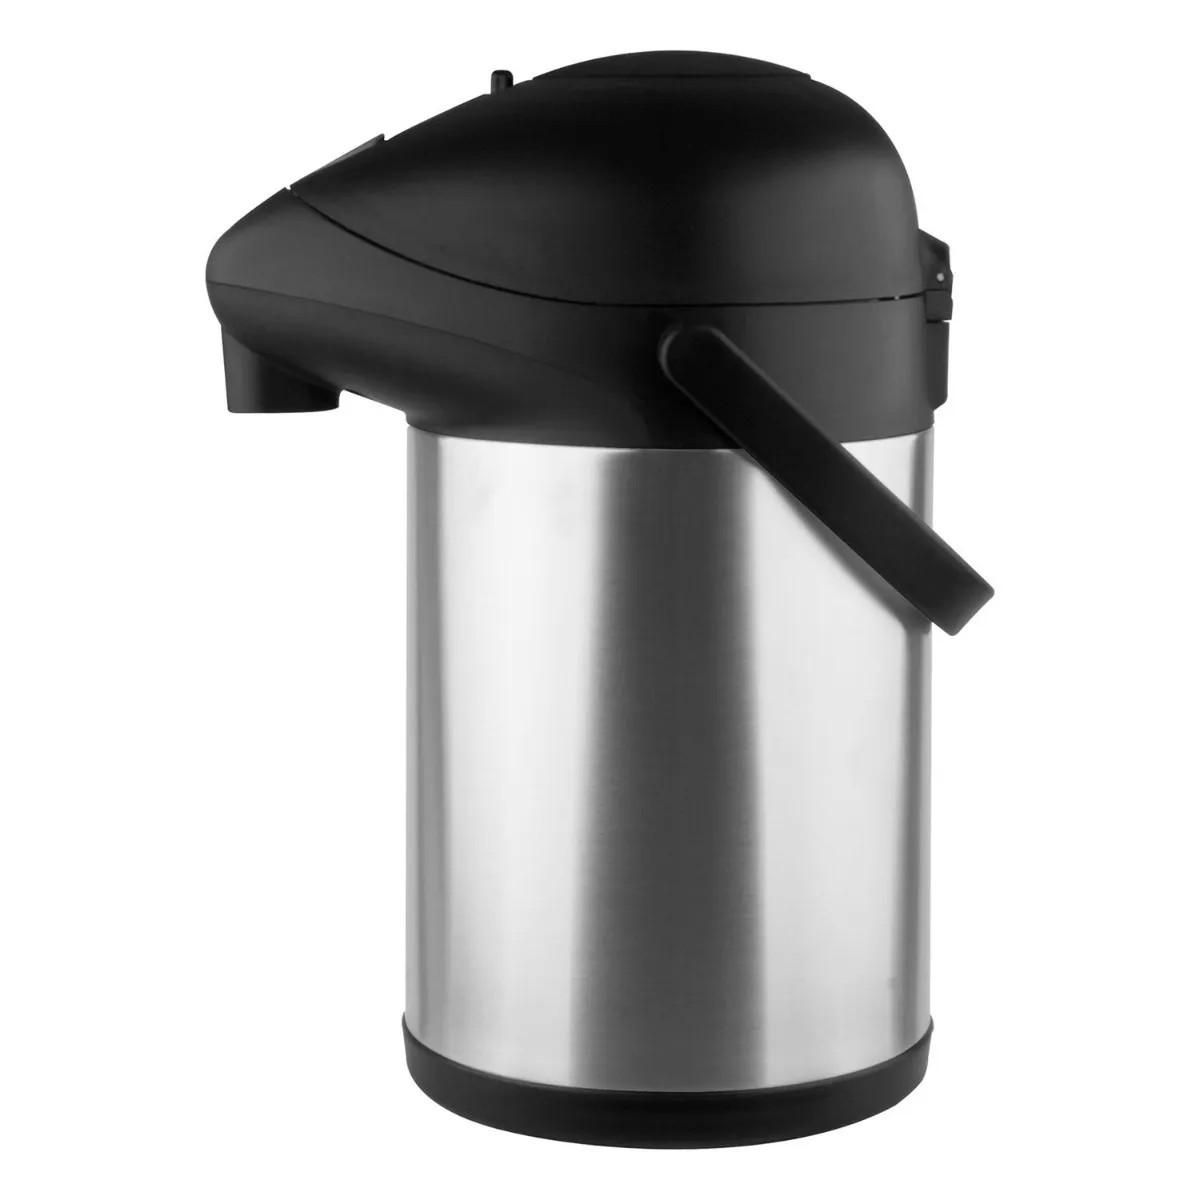 Garrafa Termica Aço Inox Pressao Trix 3,5 L Tp6505 - Termopro